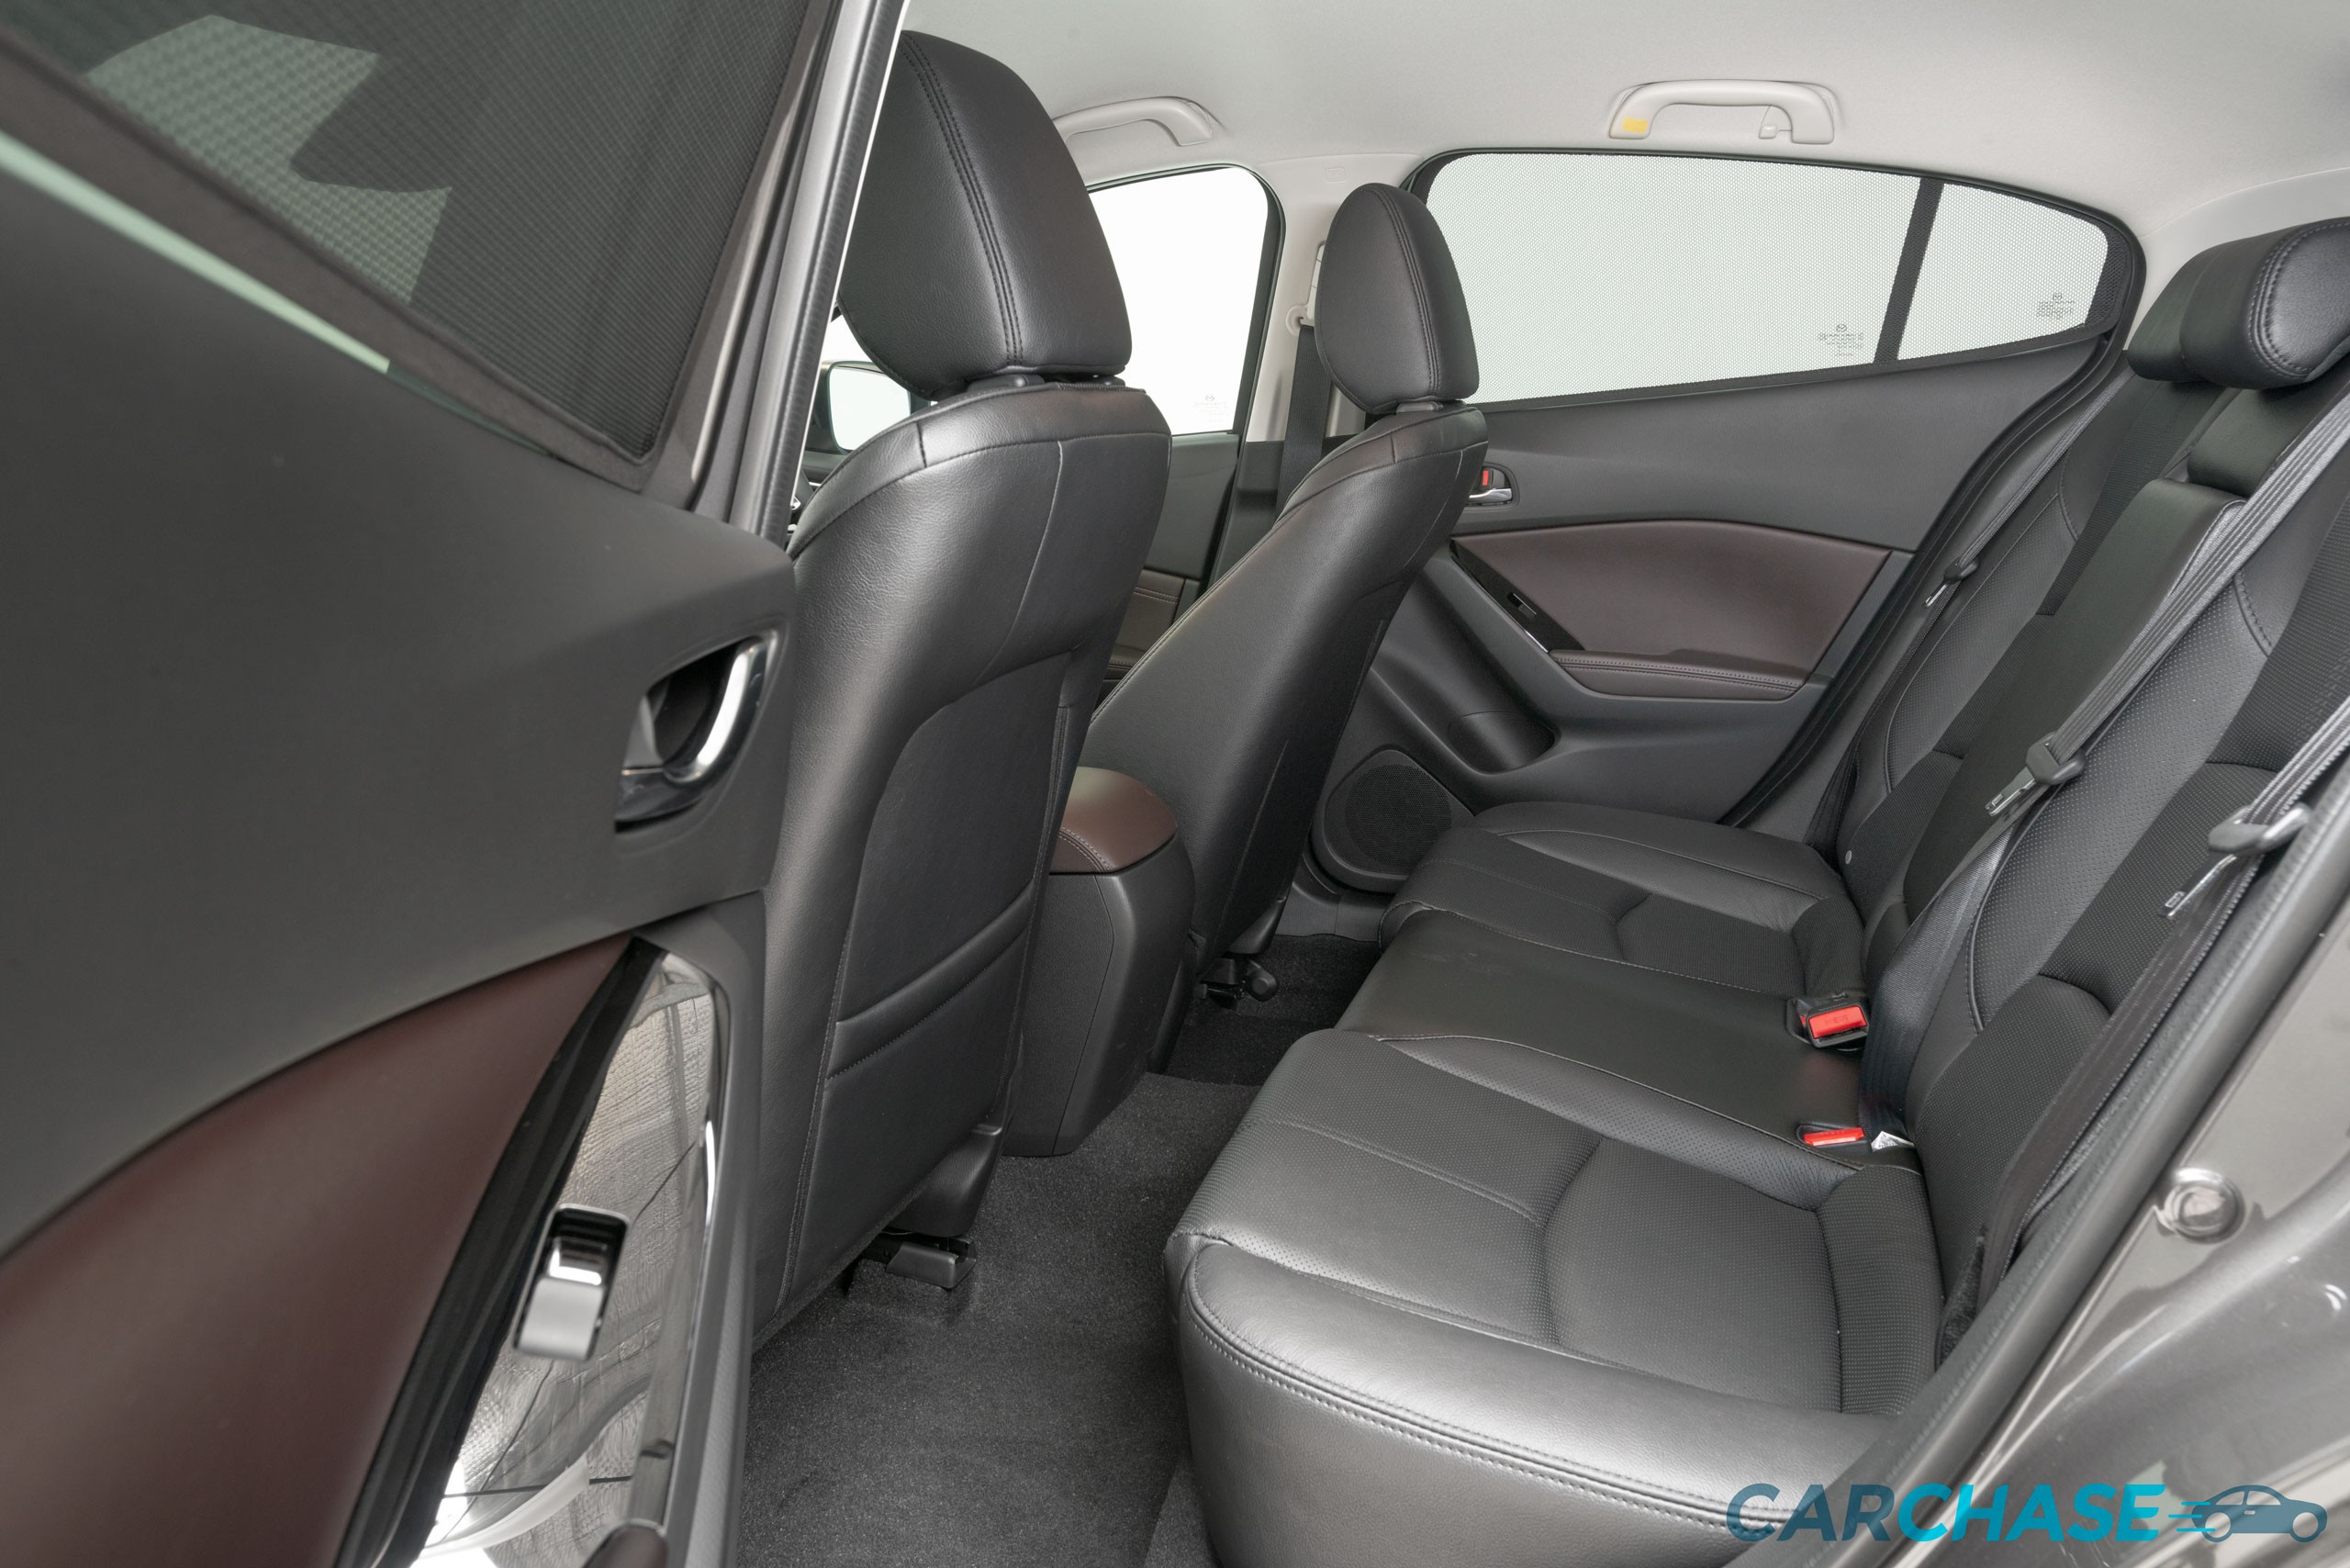 Image 10/10 of 2018 Mazda 3 Touring